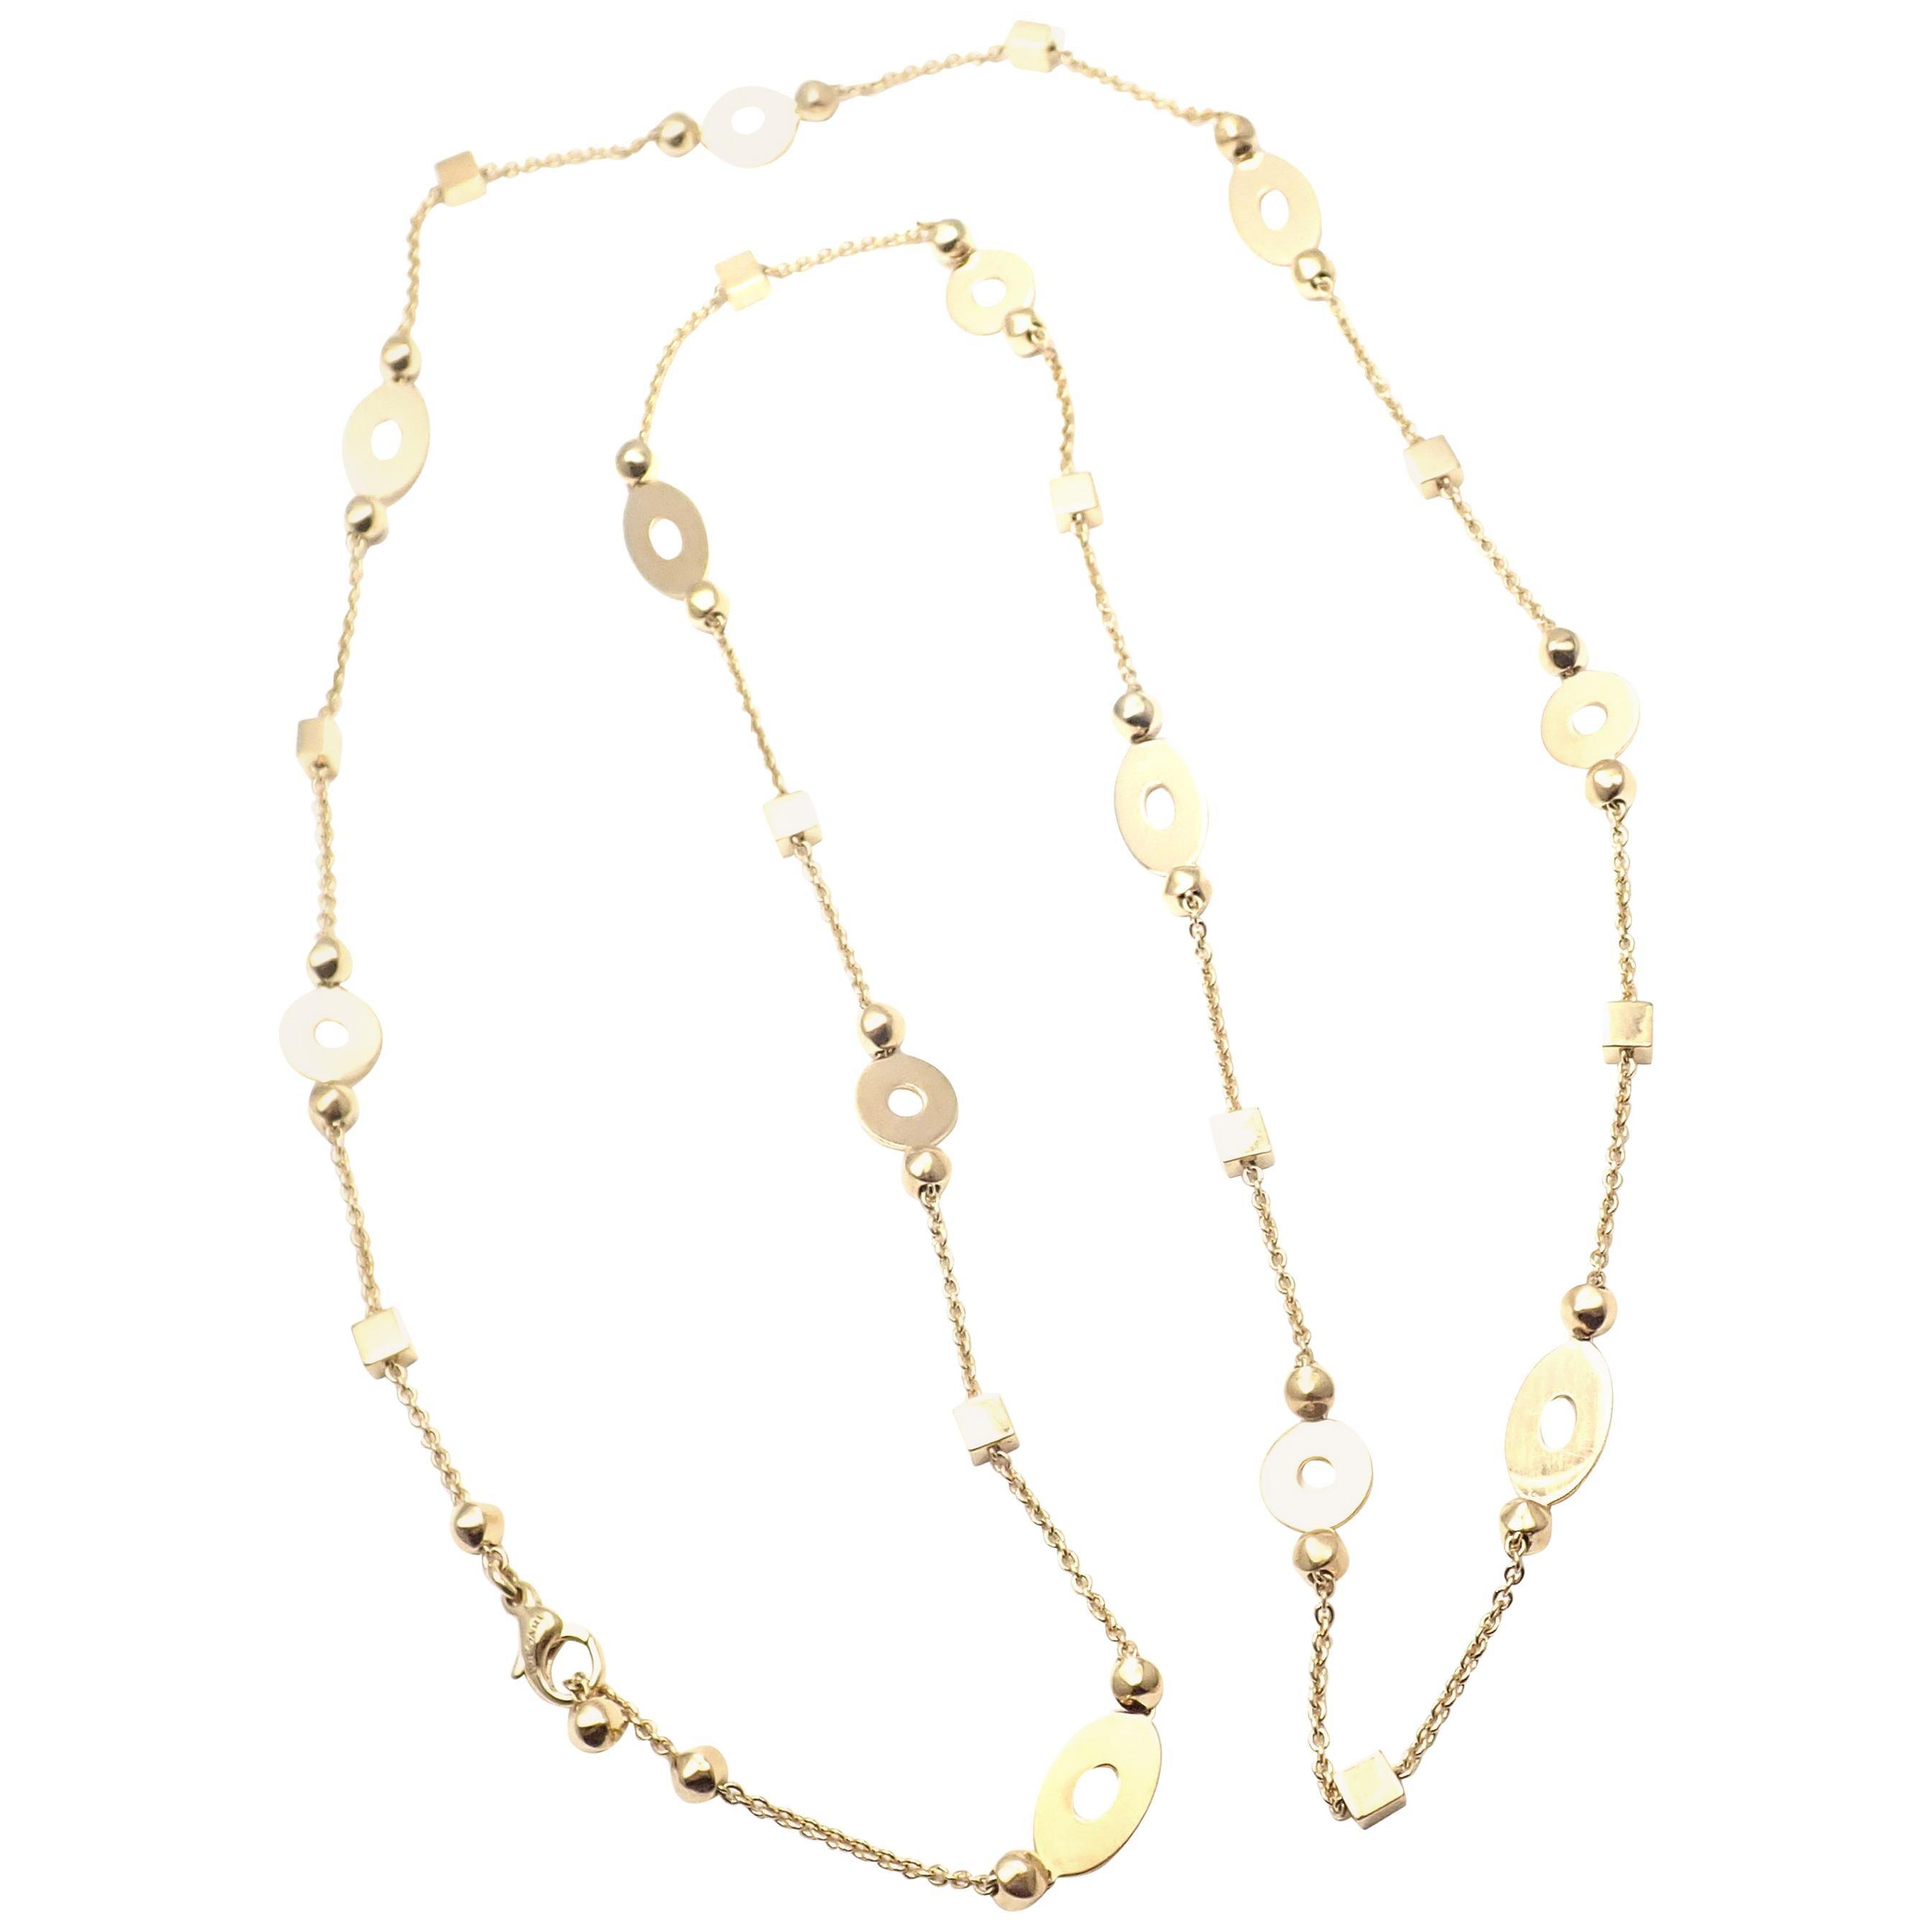 Bulgari Lucea Long Link Yellow Gold Chain Necklace